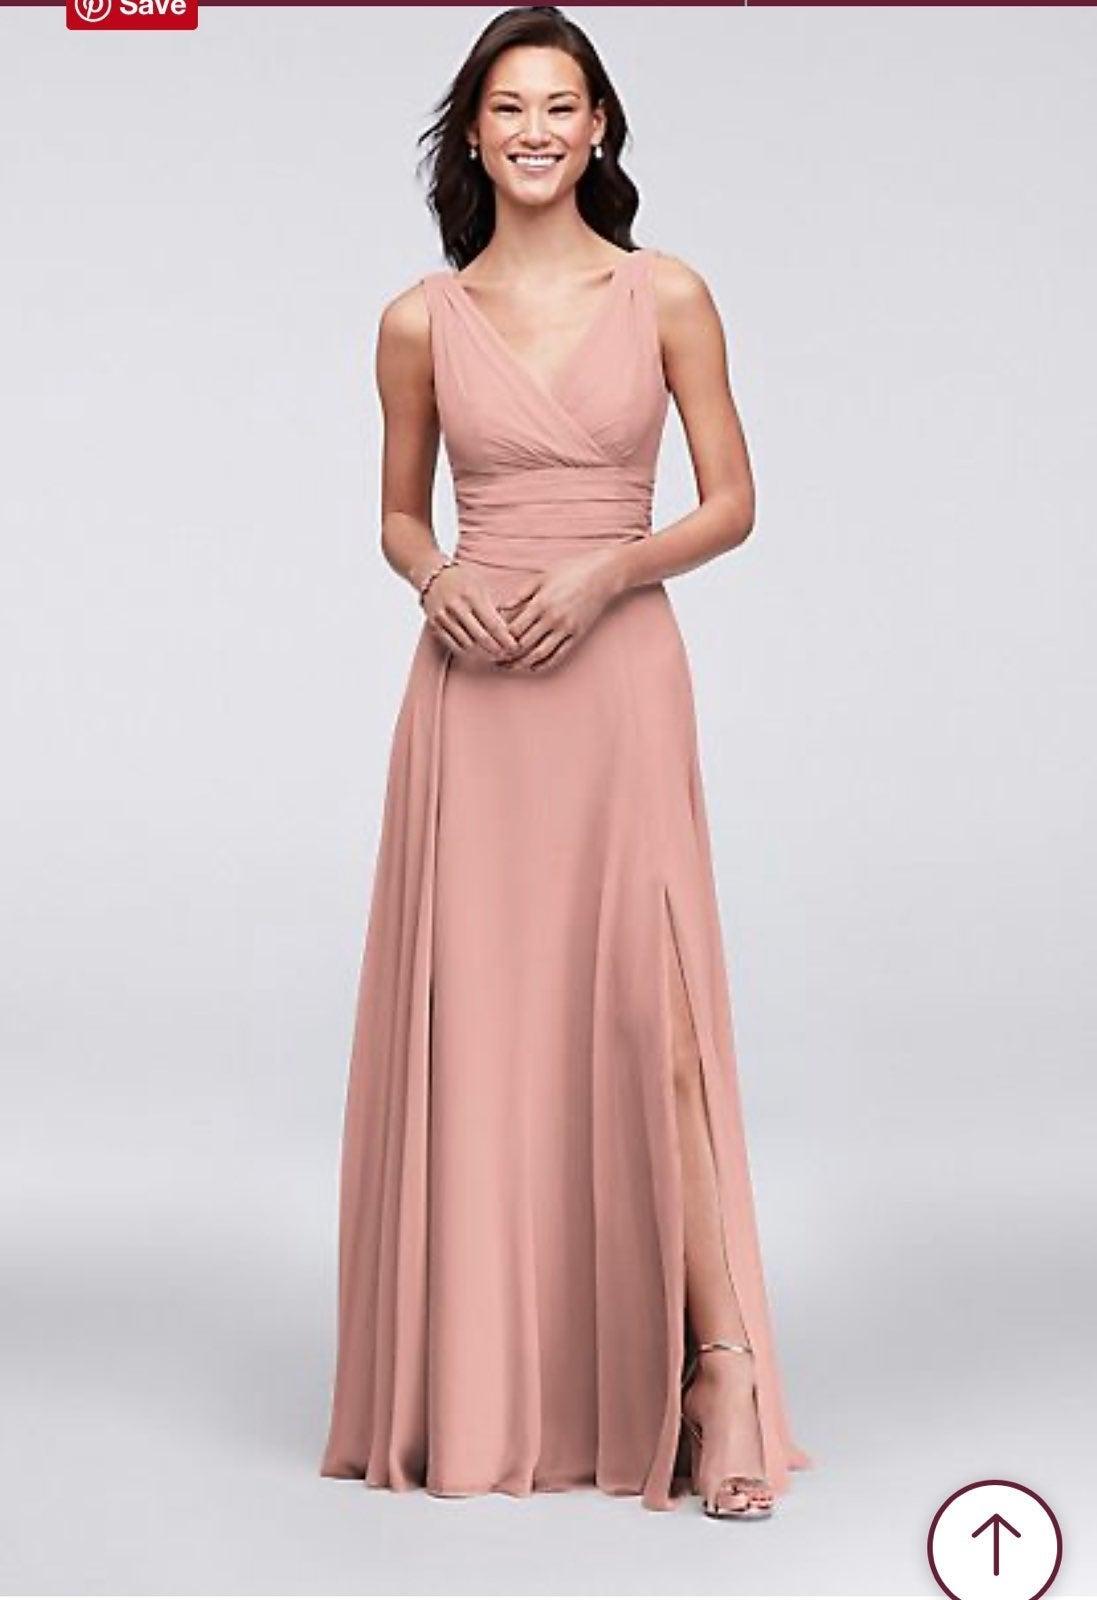 David's Bridal Surplice Bridesmaid Dress